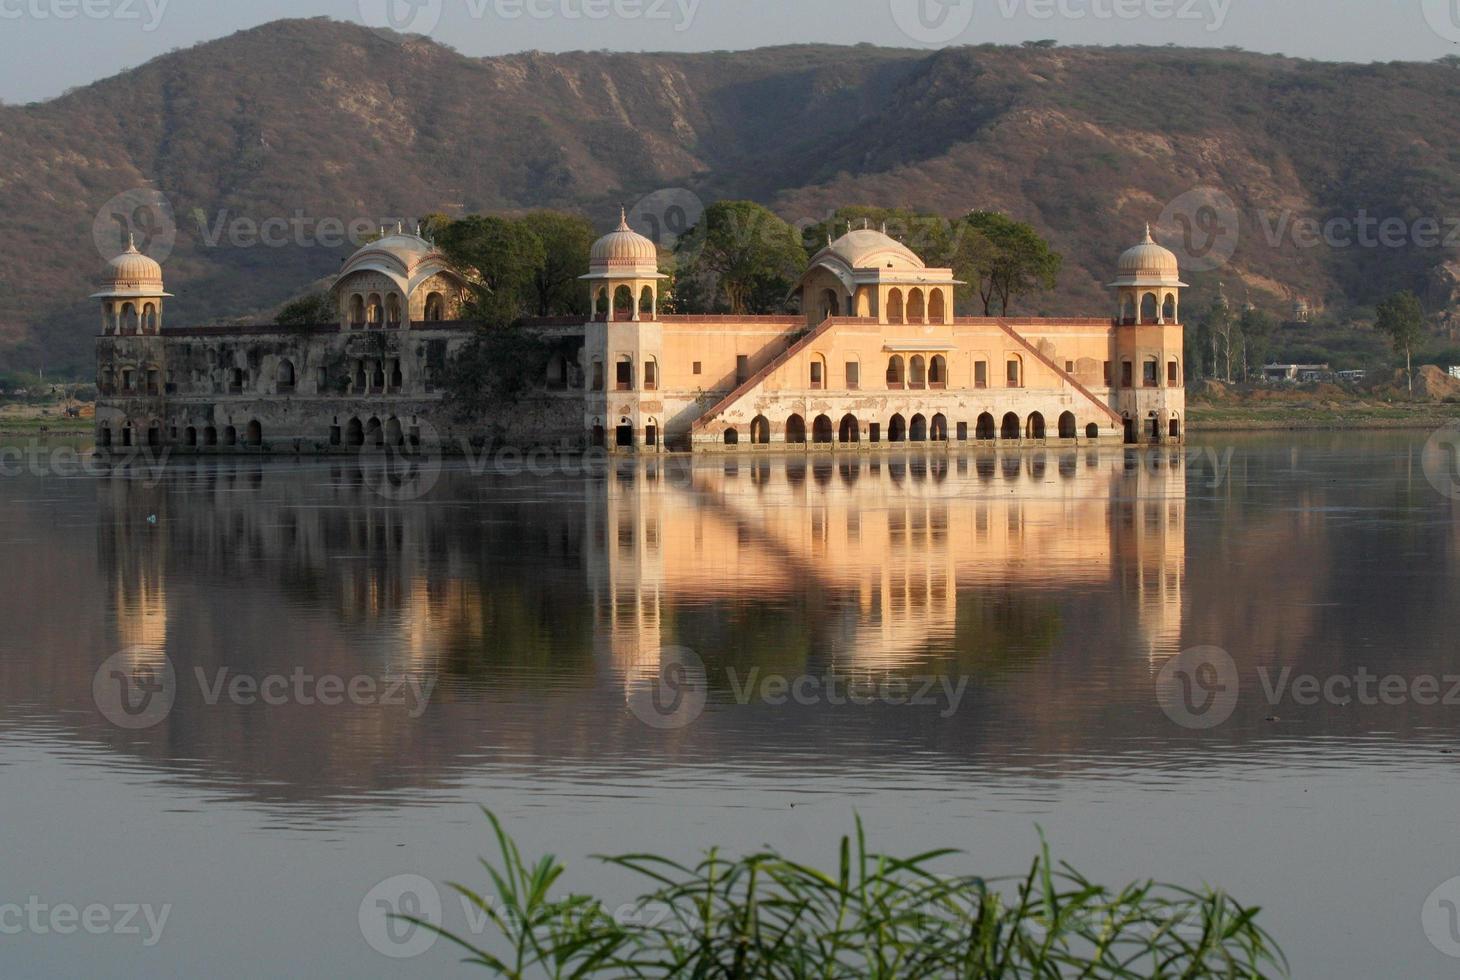 Palacio de agua jaipur india agua con reflejos foto